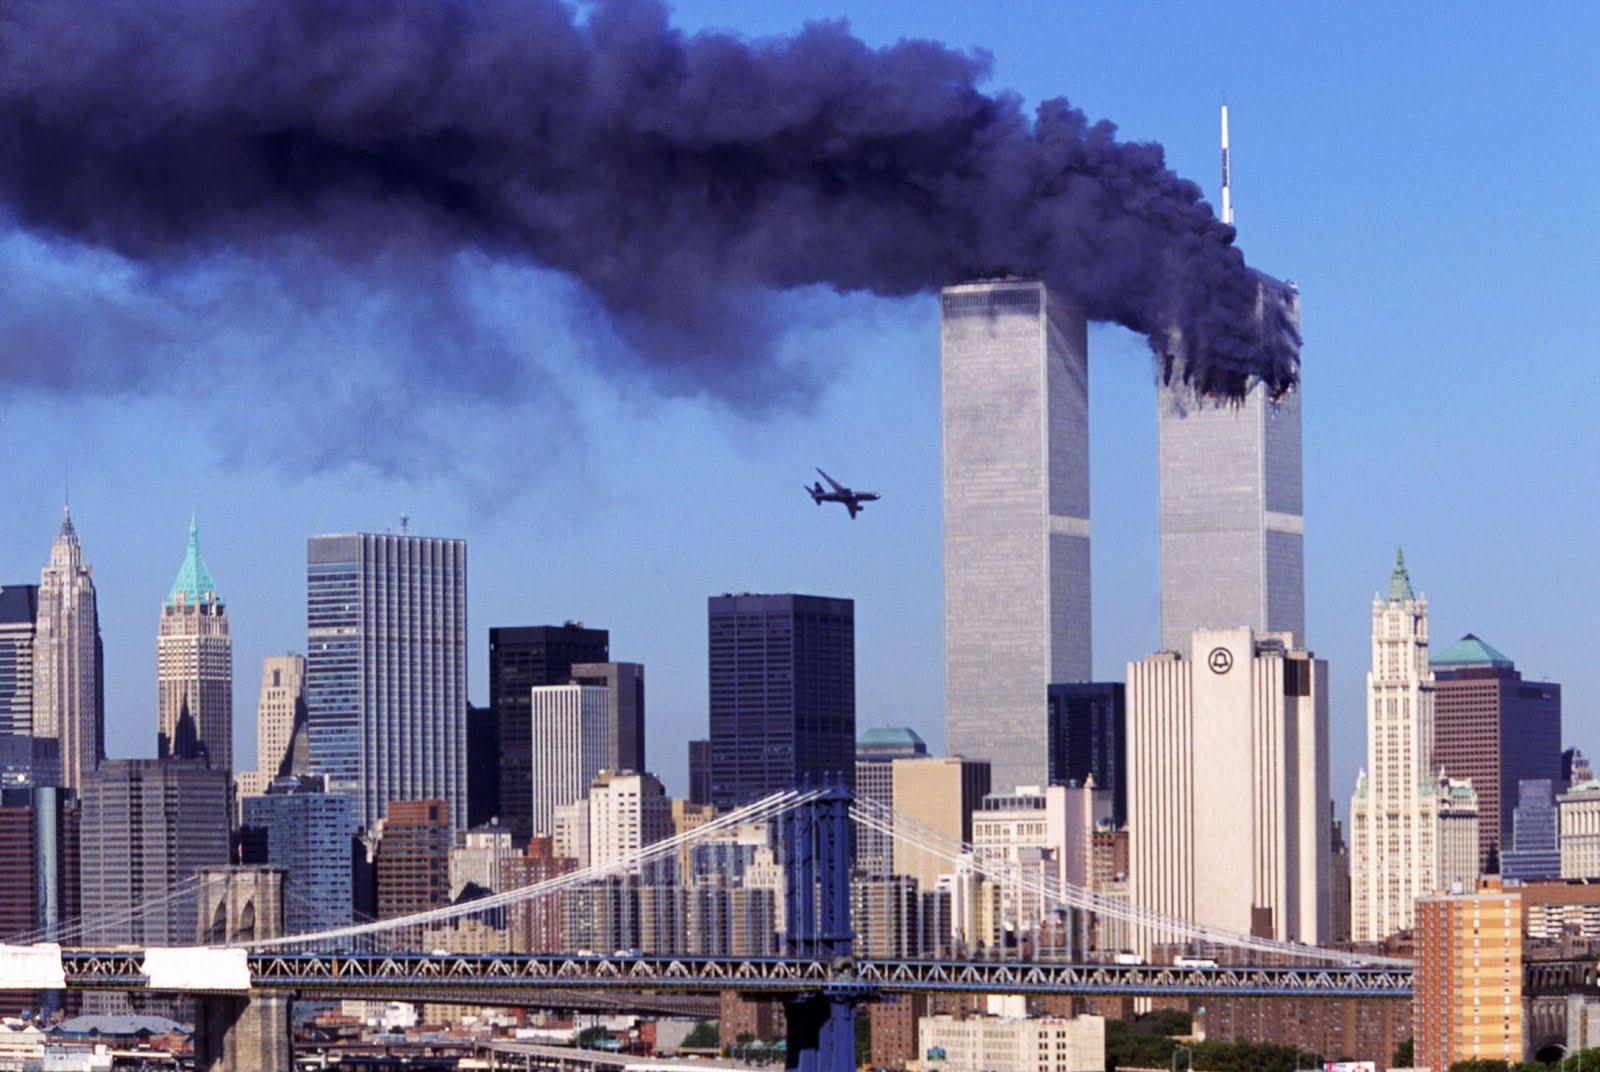 Airplane crashes to the world trade center new york 11 sept 2001 2